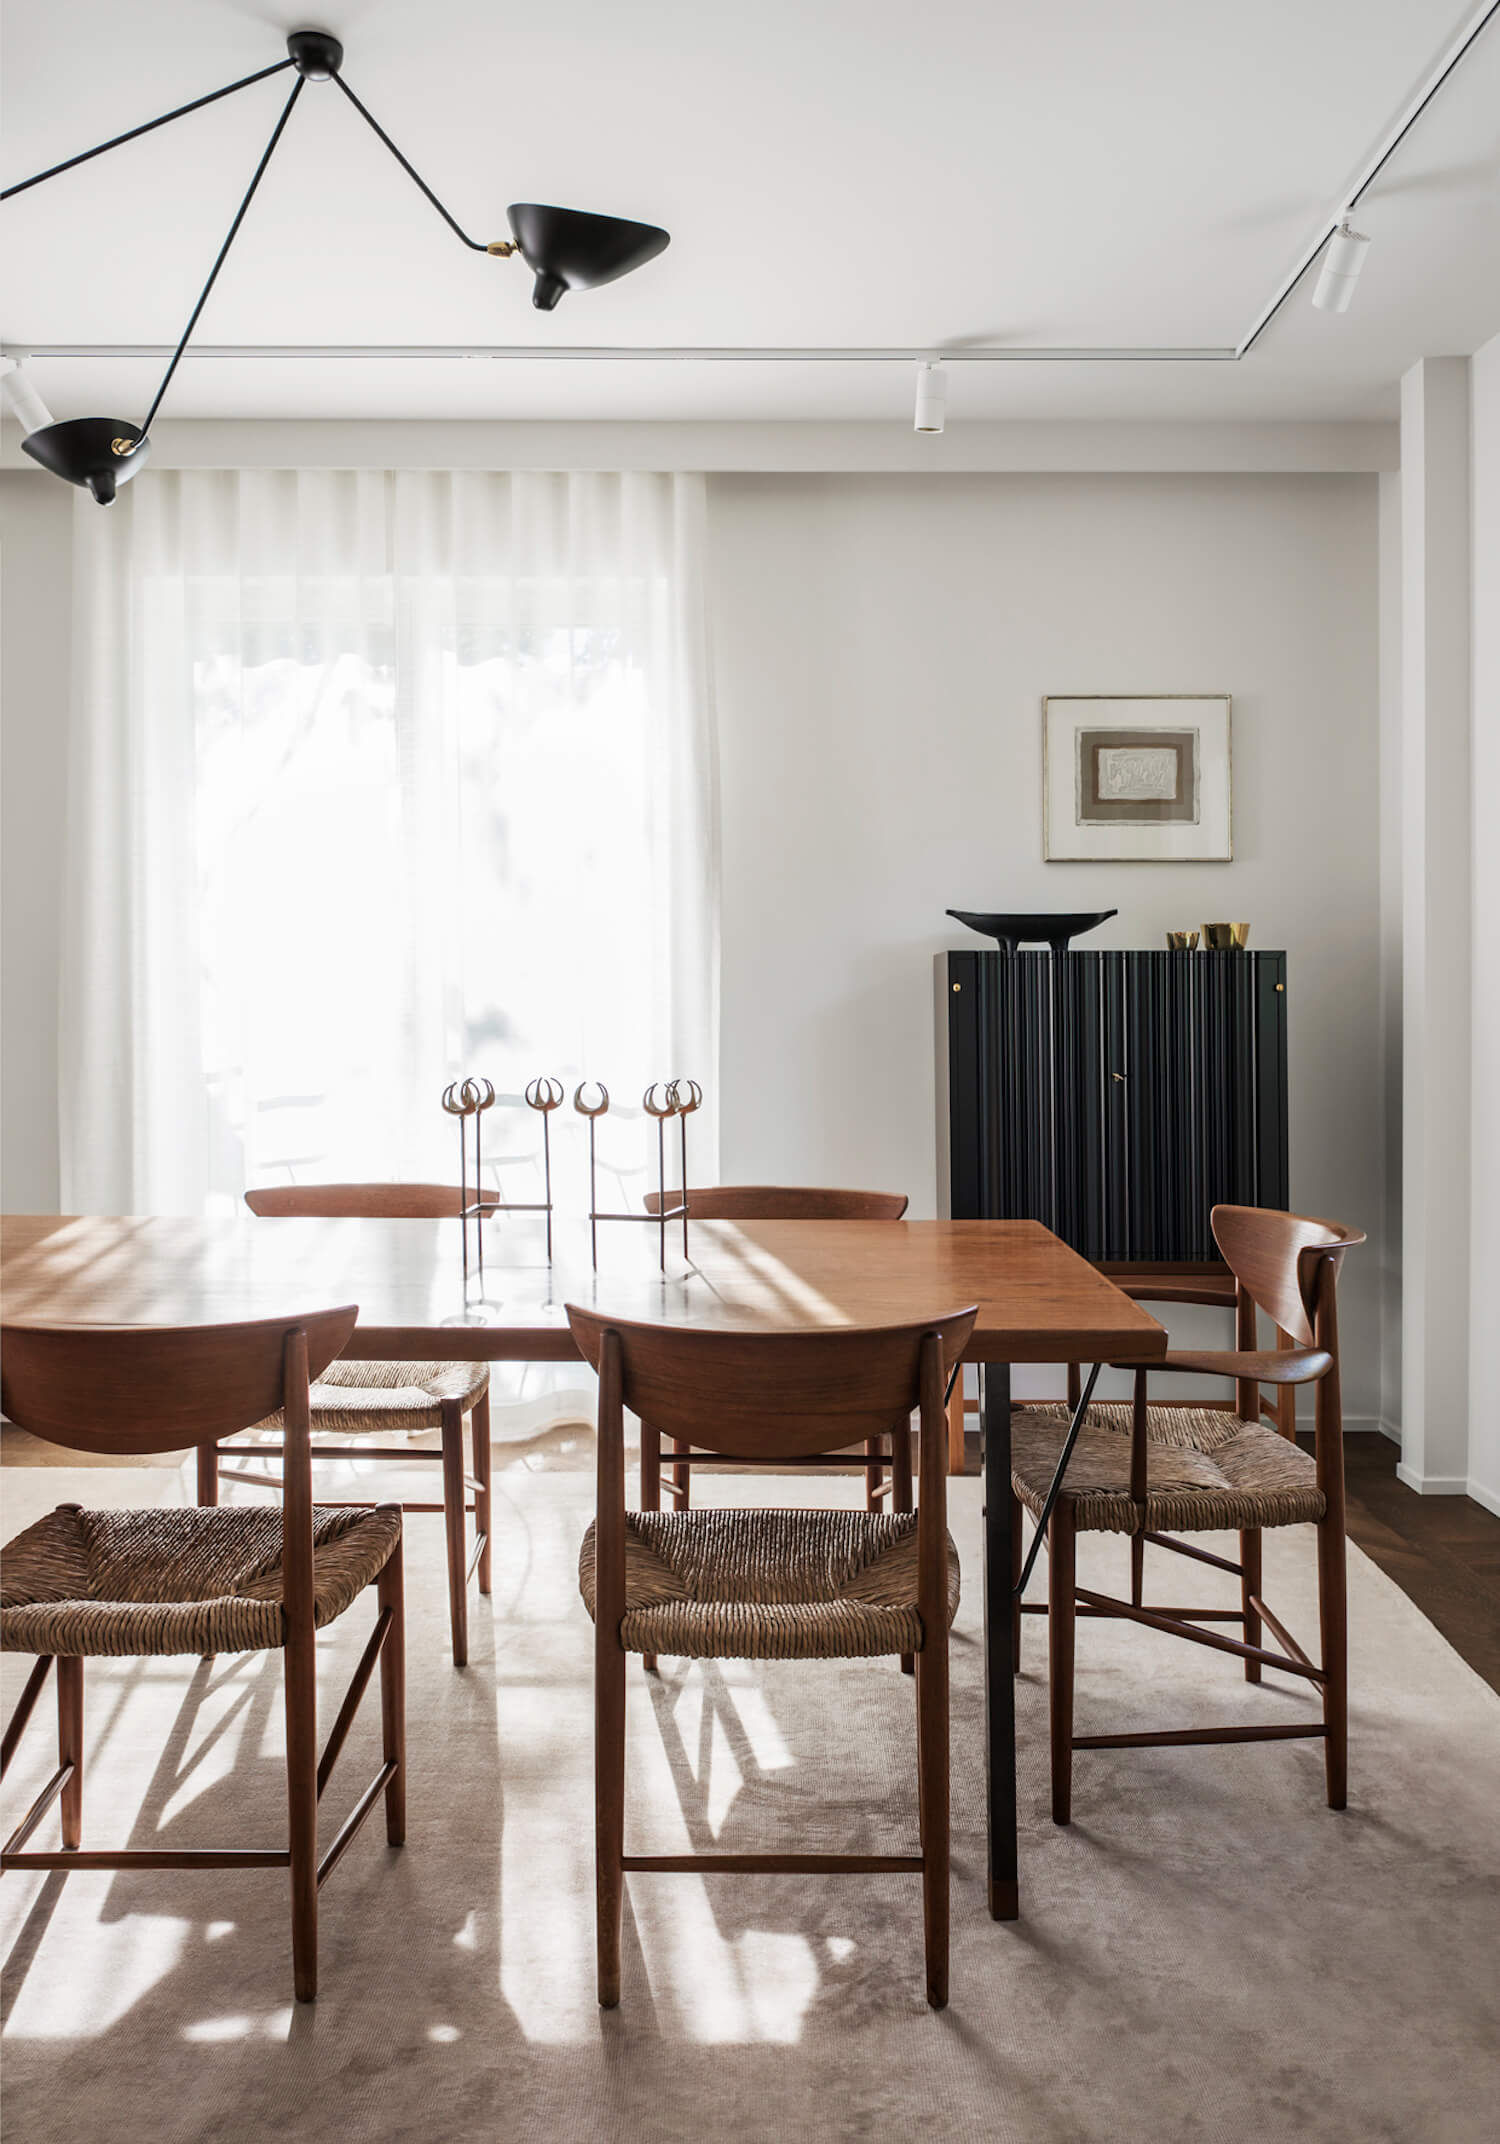 est living interiors lidingo home liljencrantz design 2